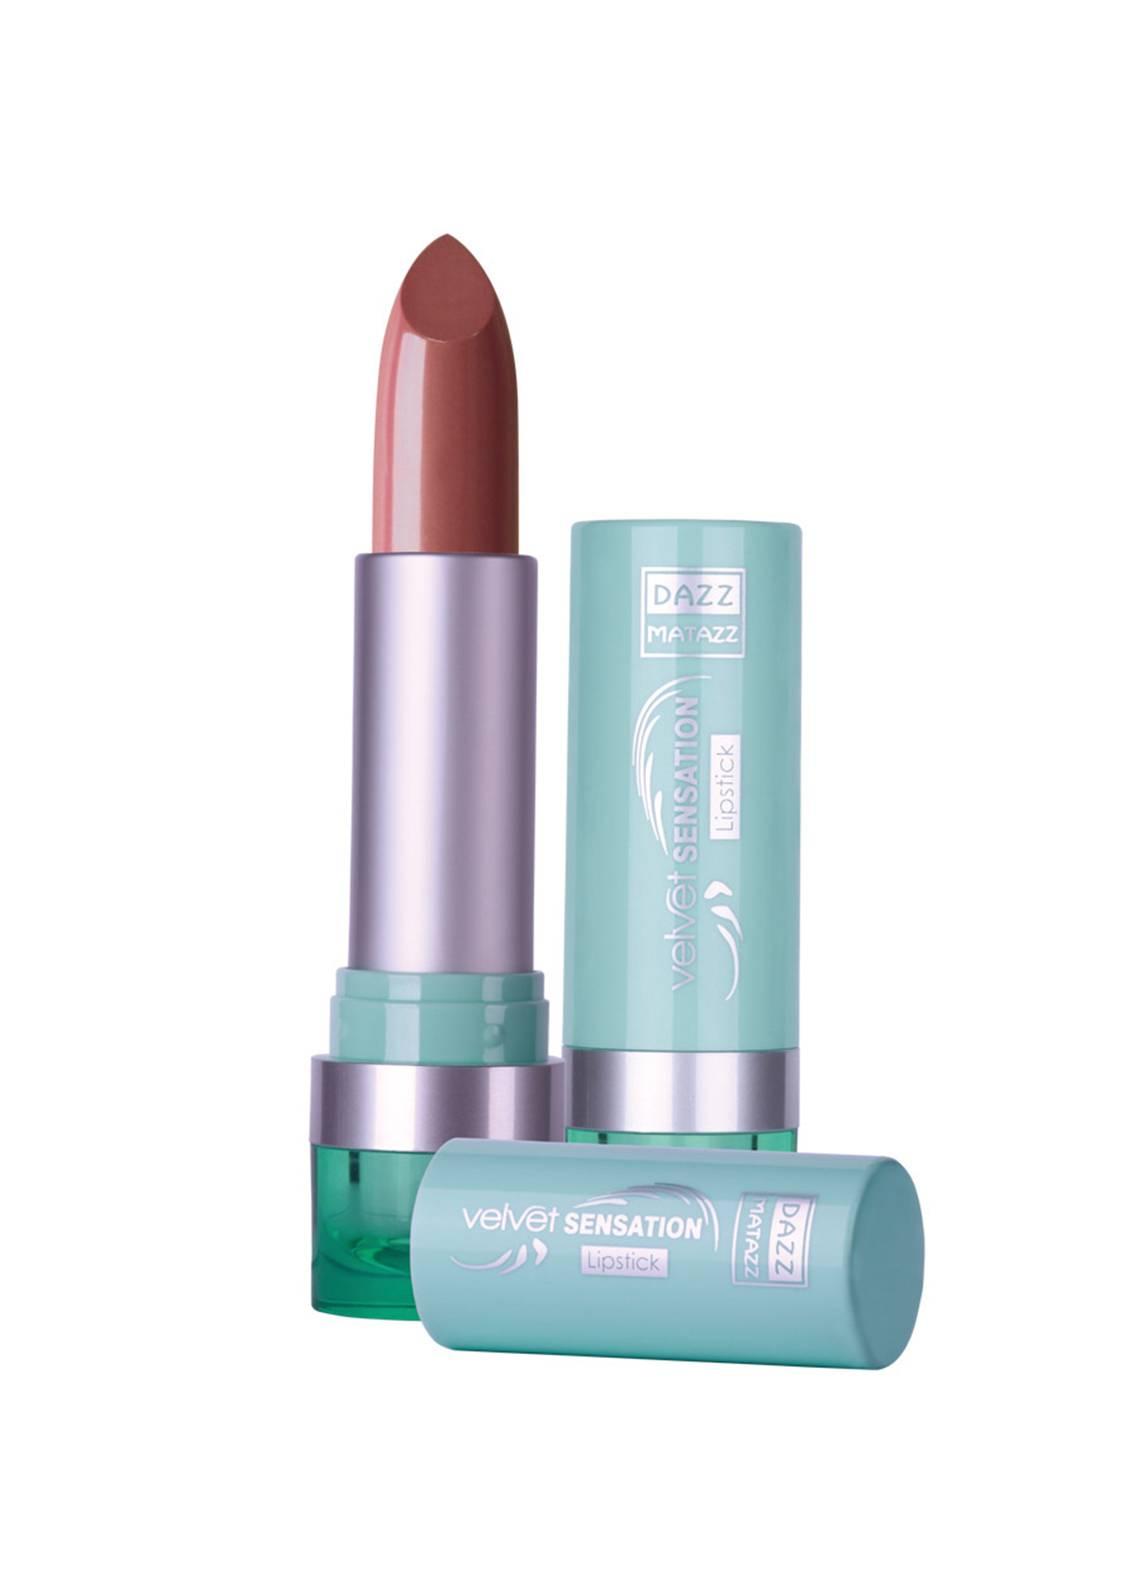 Dazz Matazz Velvet Sensation Lipstick-15 ROASTED ALMOND